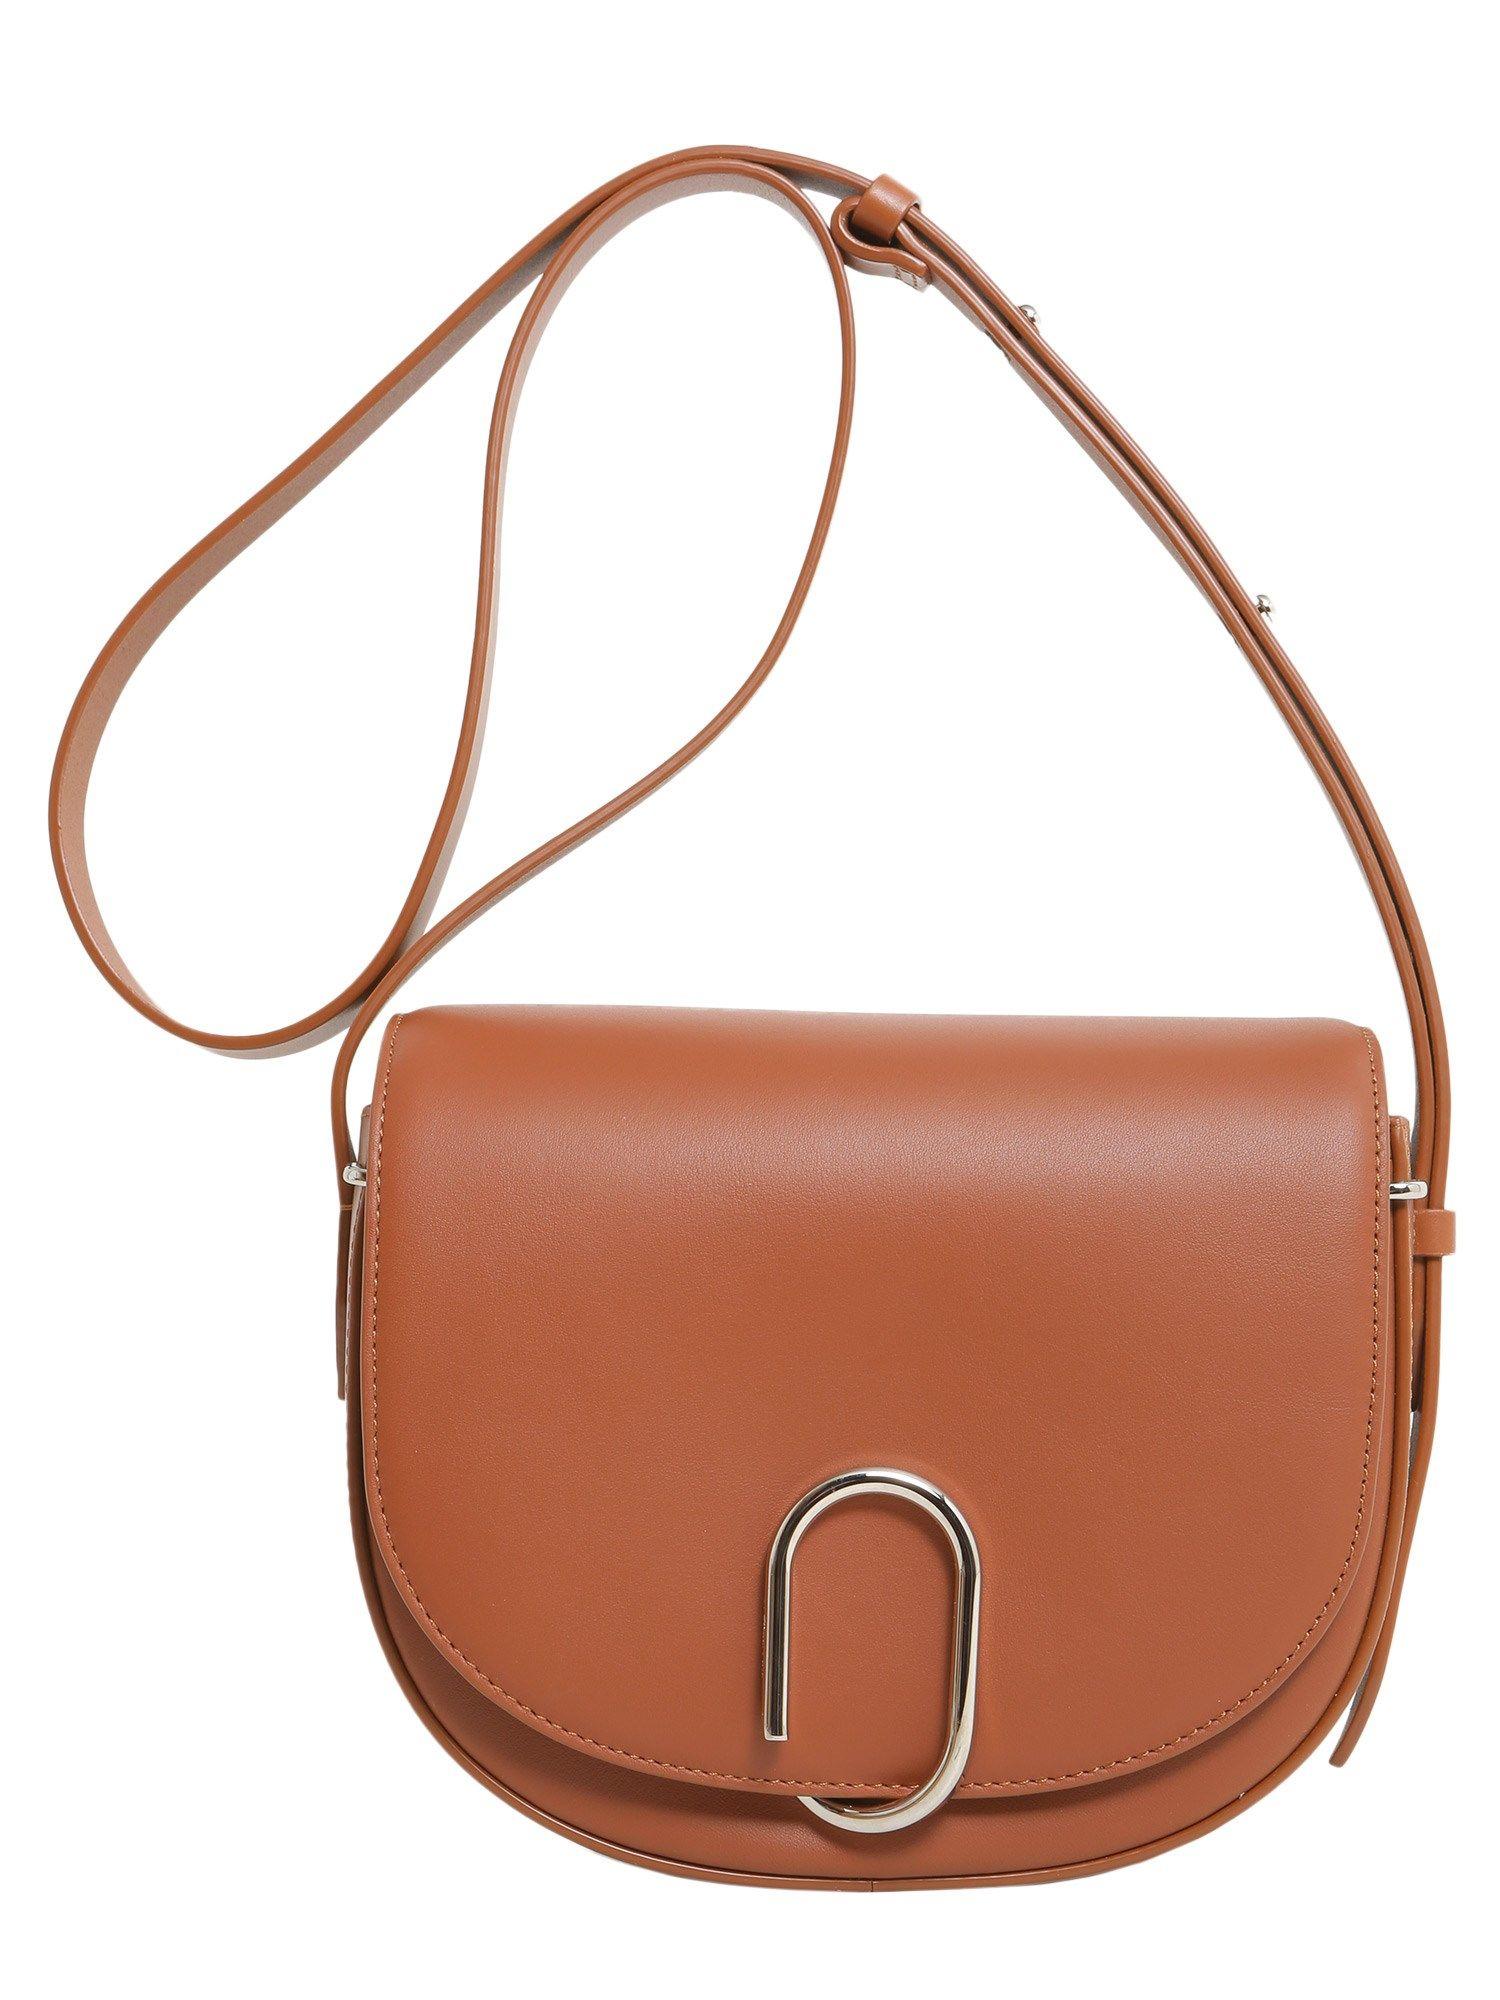 Alix Saddle Bag